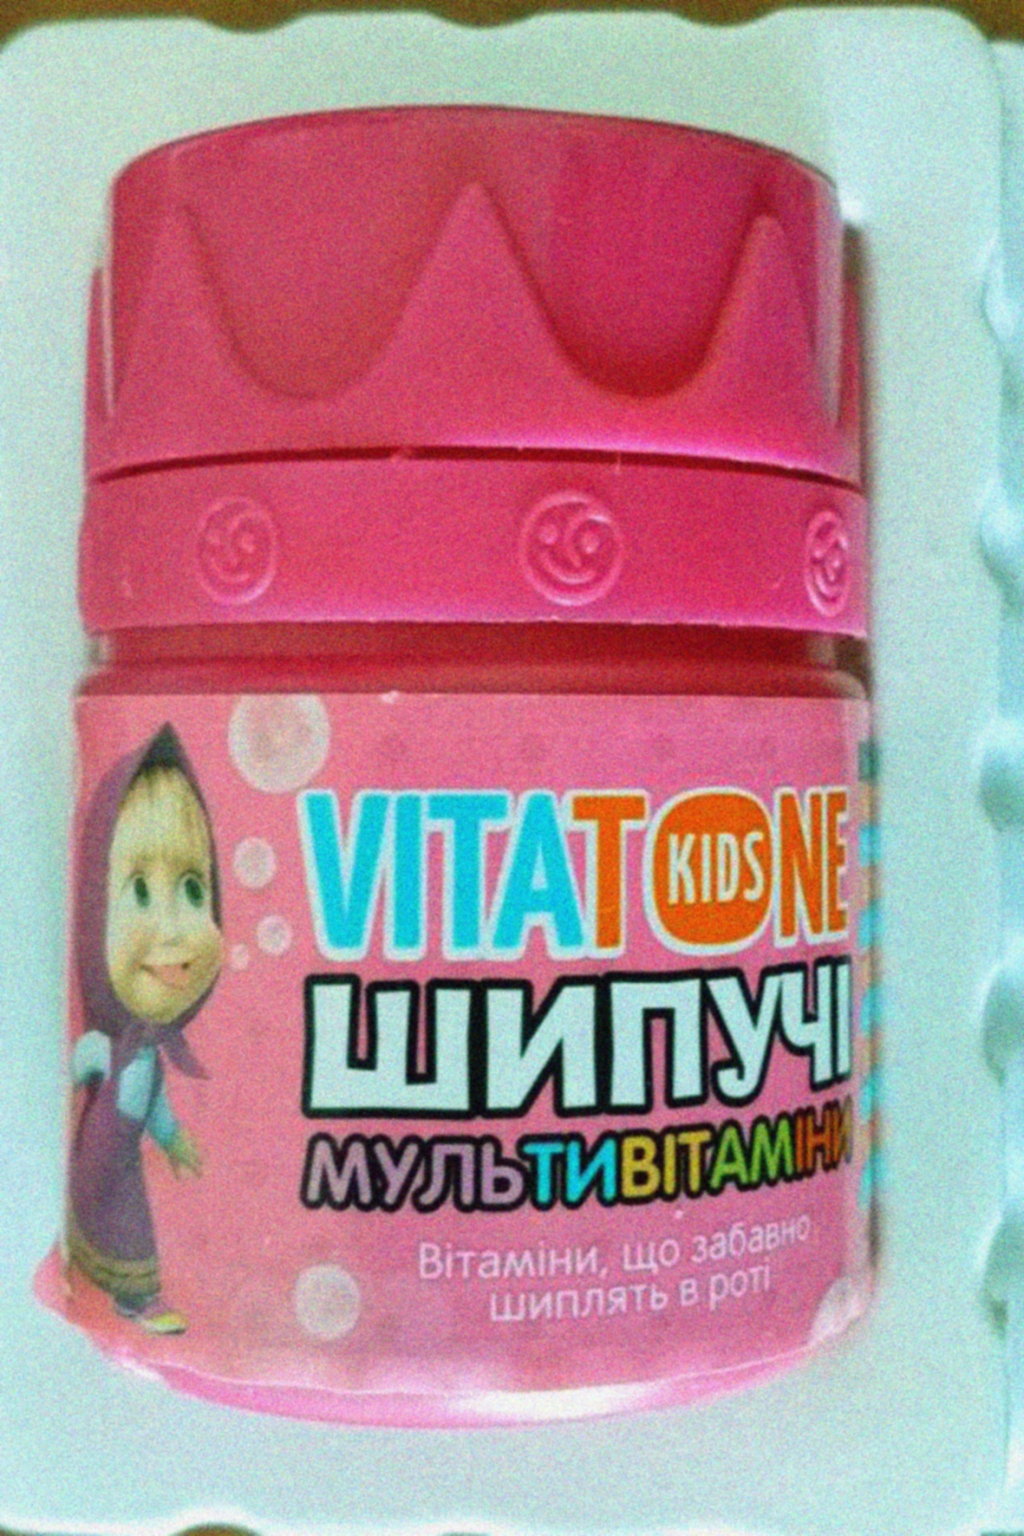 VitaTone Kids шипучие мультивитамины - Шипучие мультивитамины VITATONE Kids